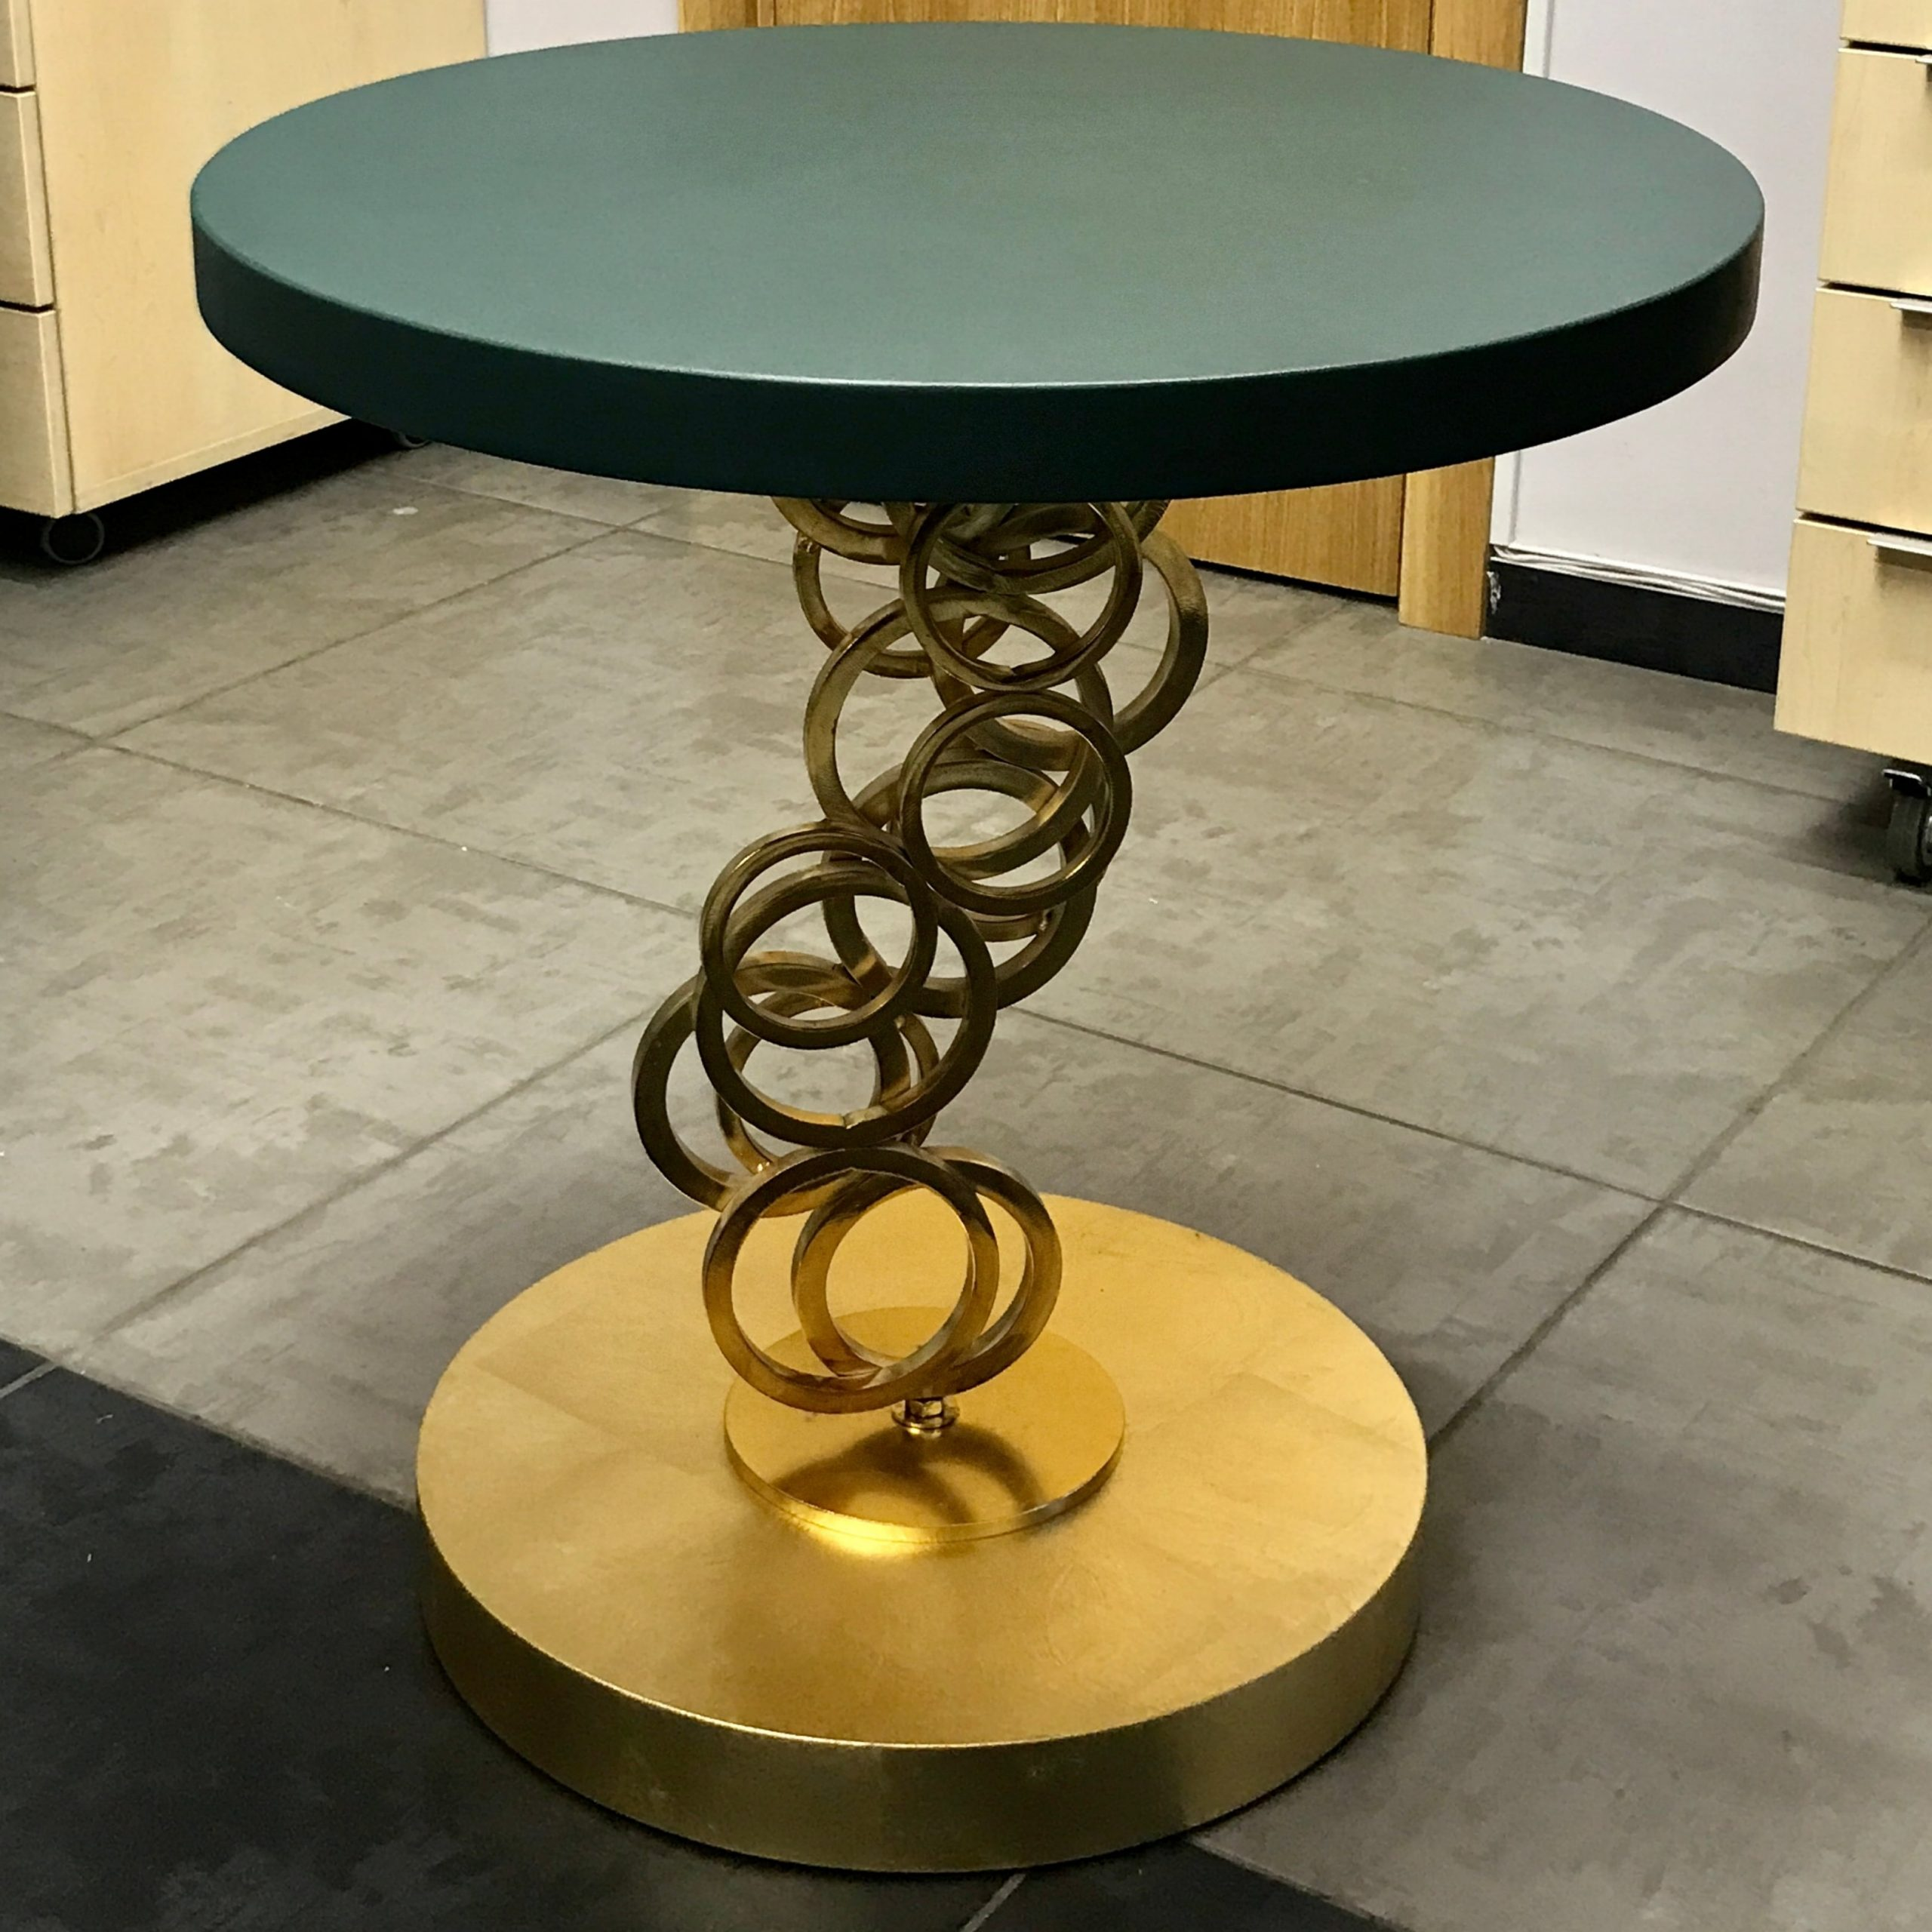 Стол после декорирования (Vse Repair)